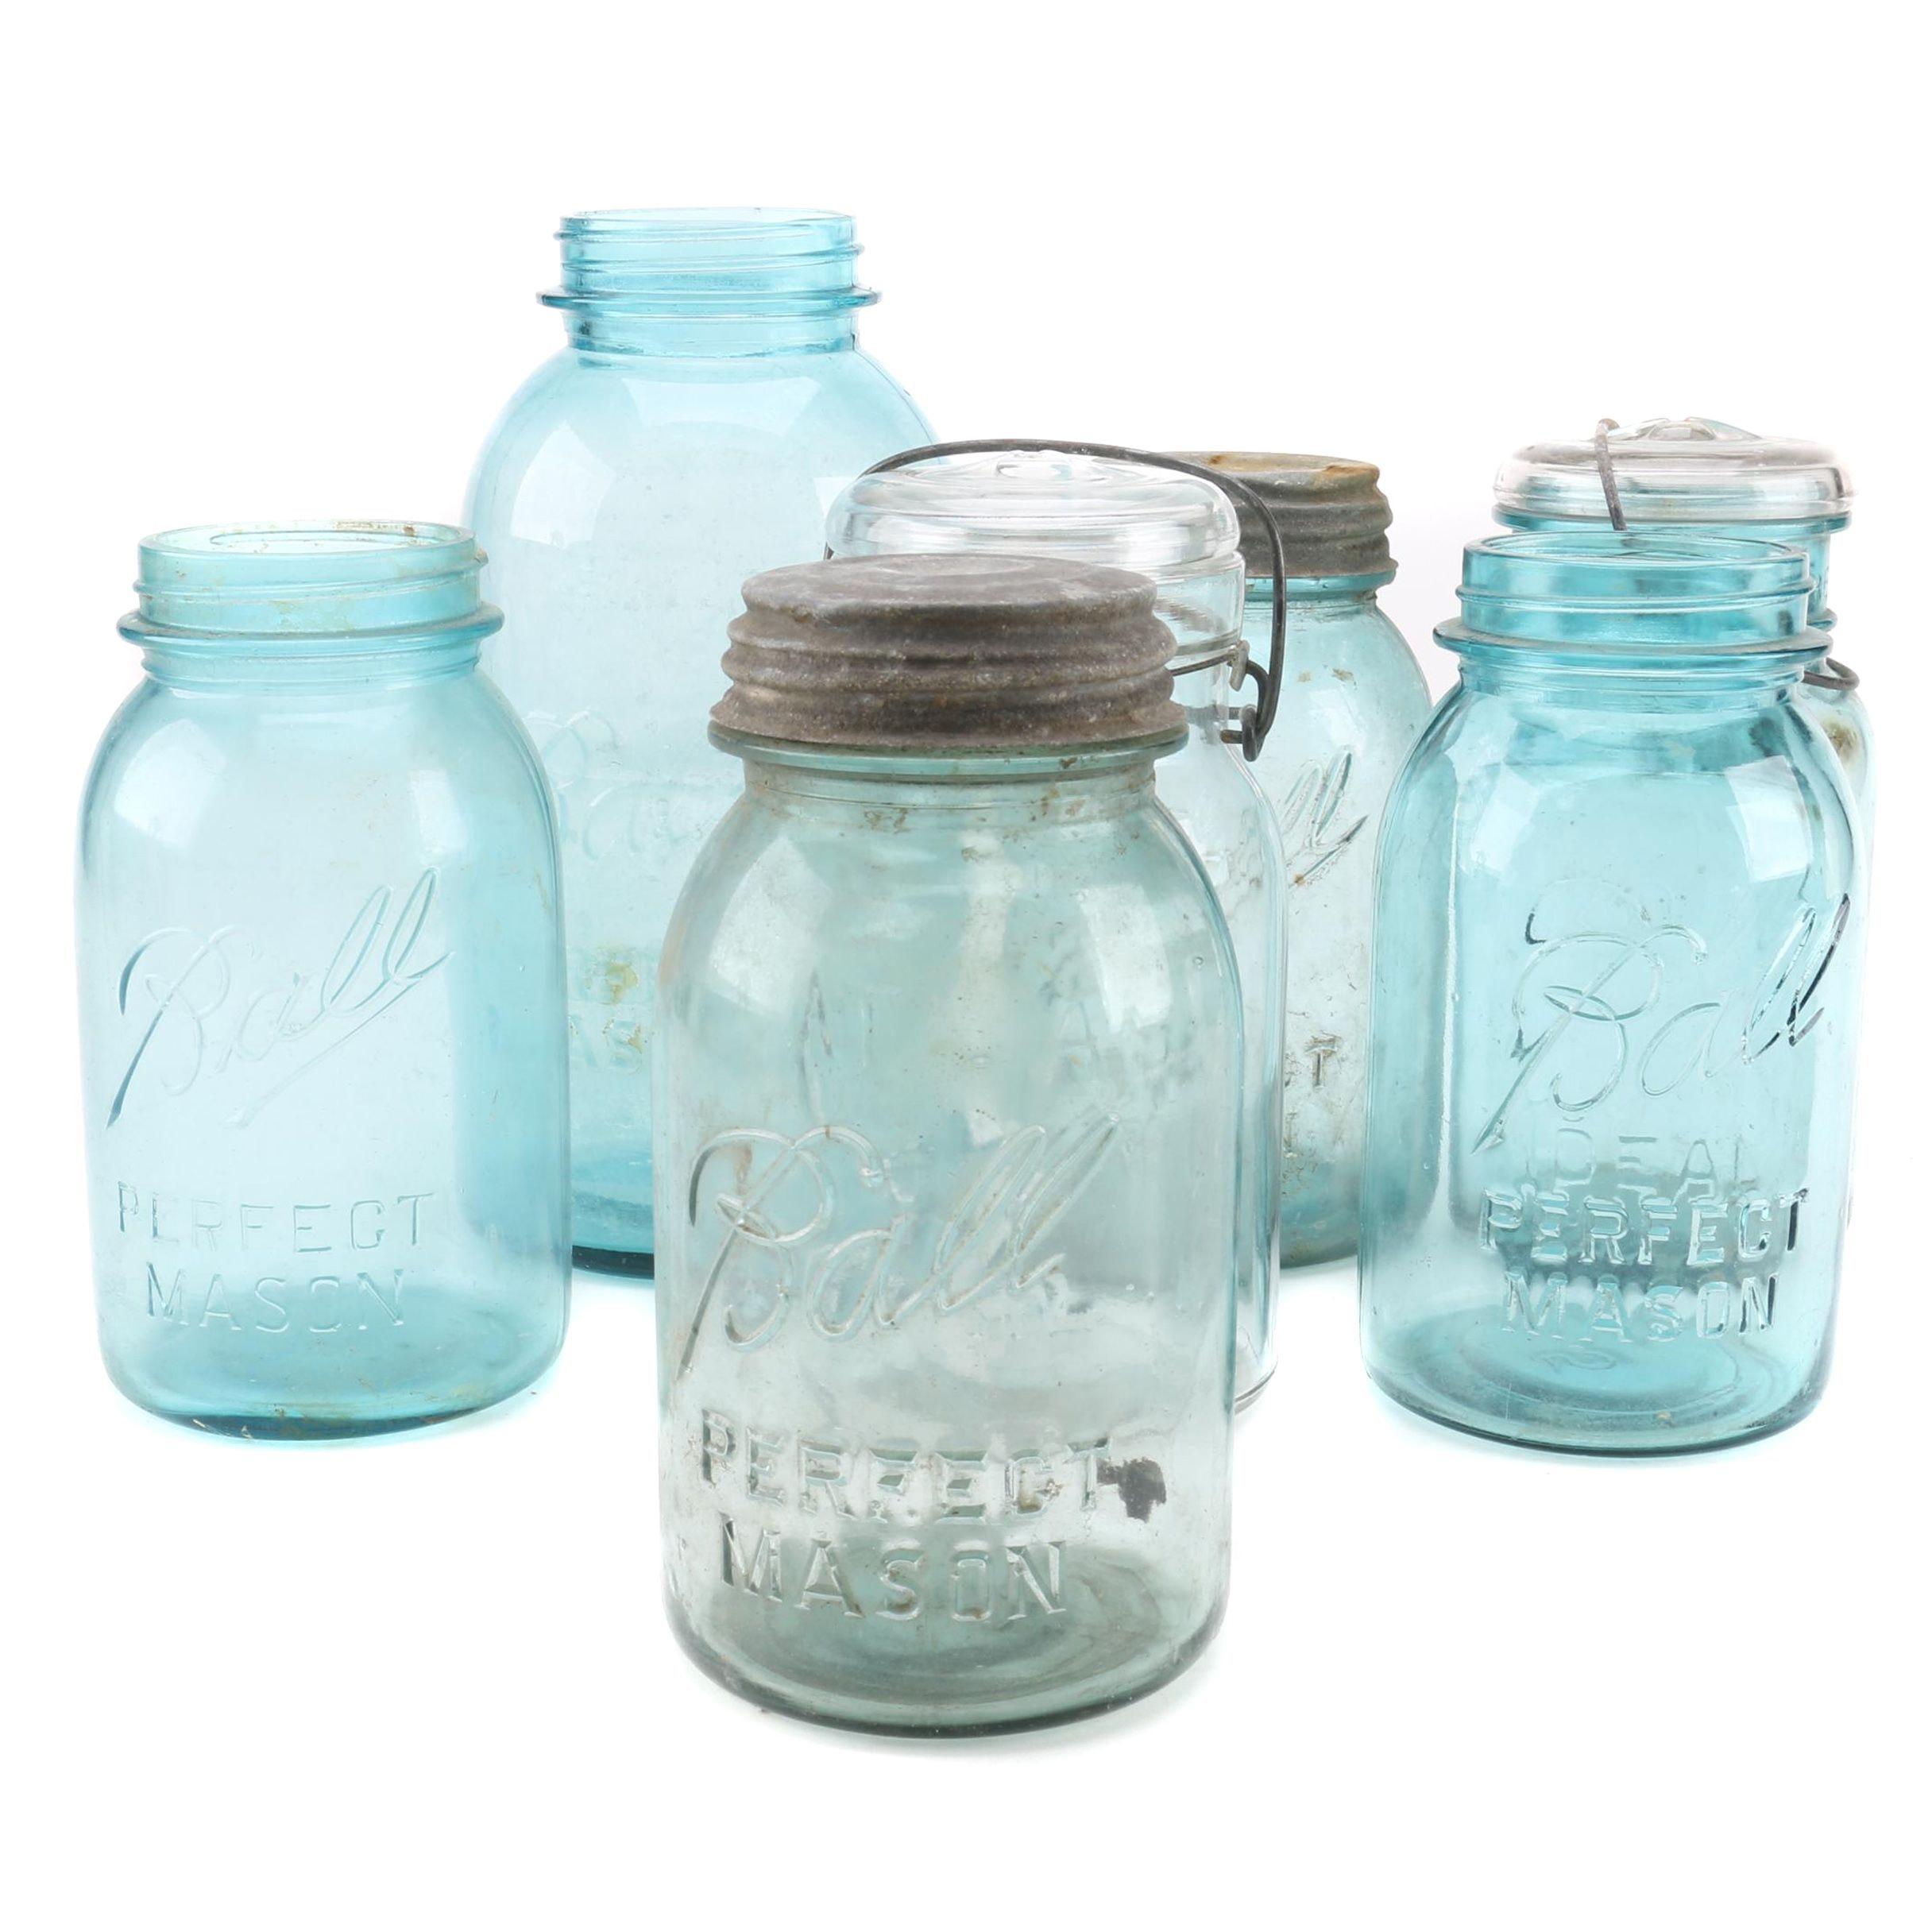 Collection of Blue Mason Jars